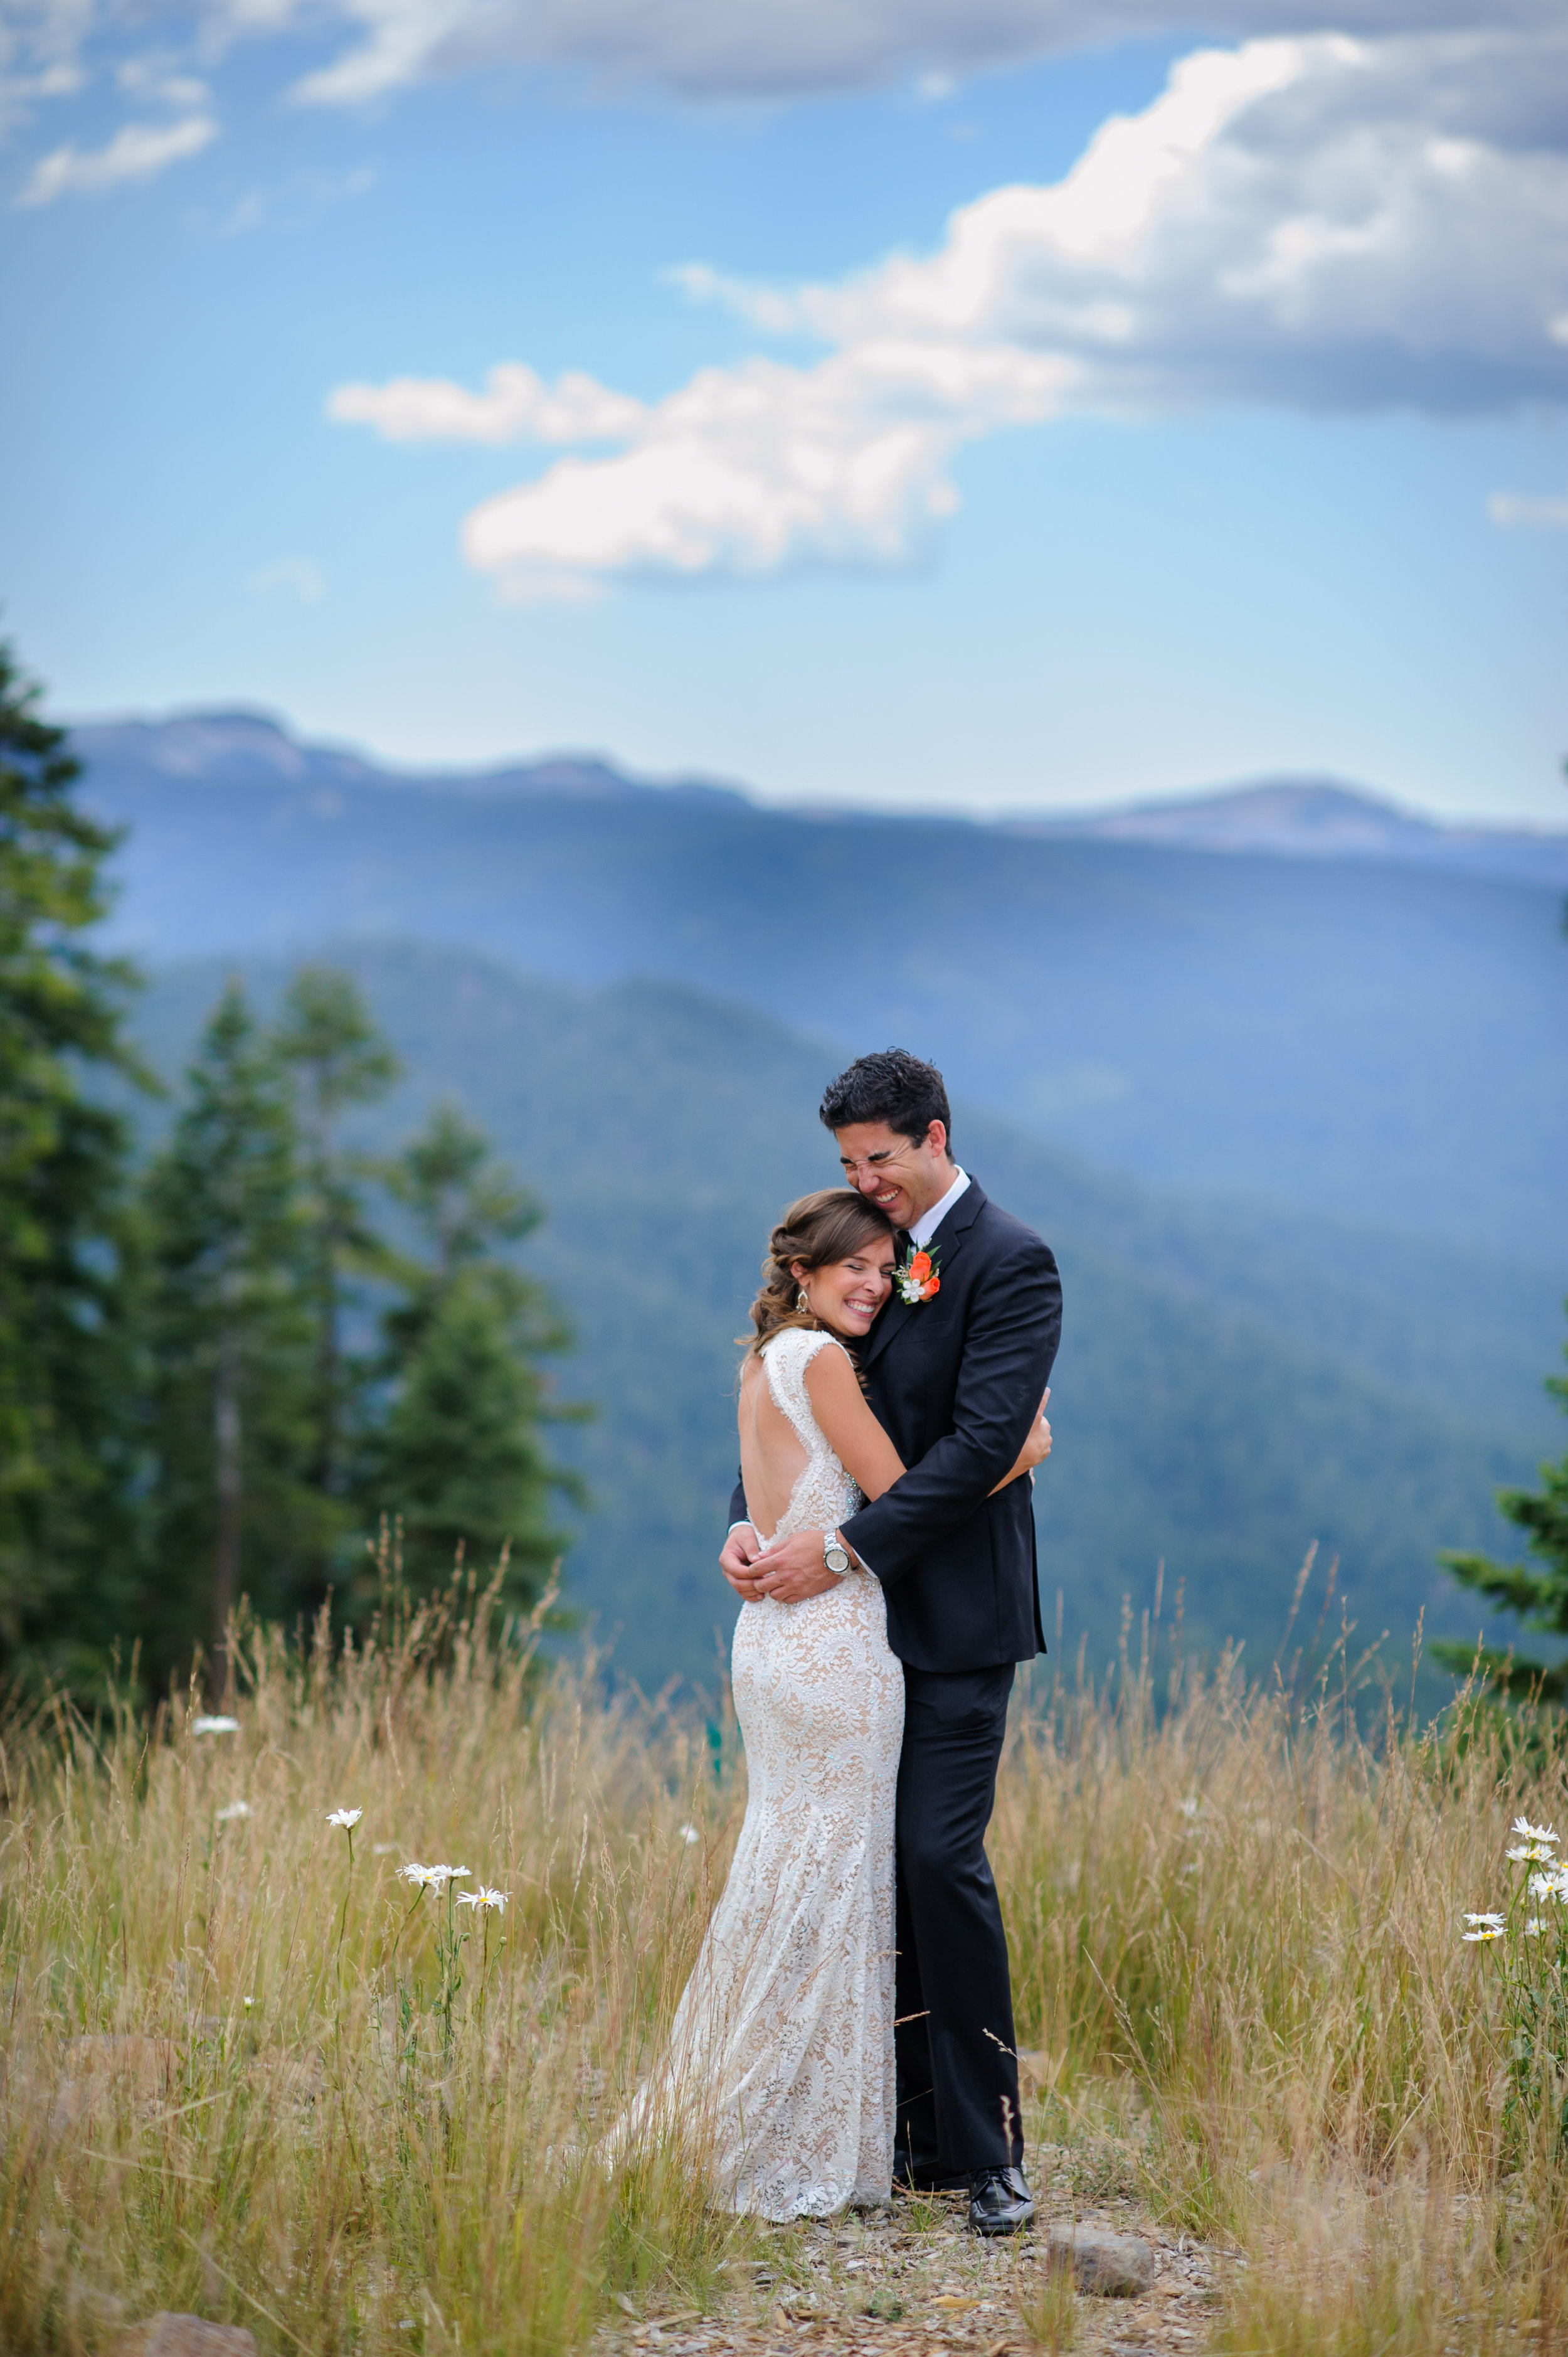 katie-myles-006-northstar-resort-tahoe-wedding-photographer-katherine-nicole-photography.JPG